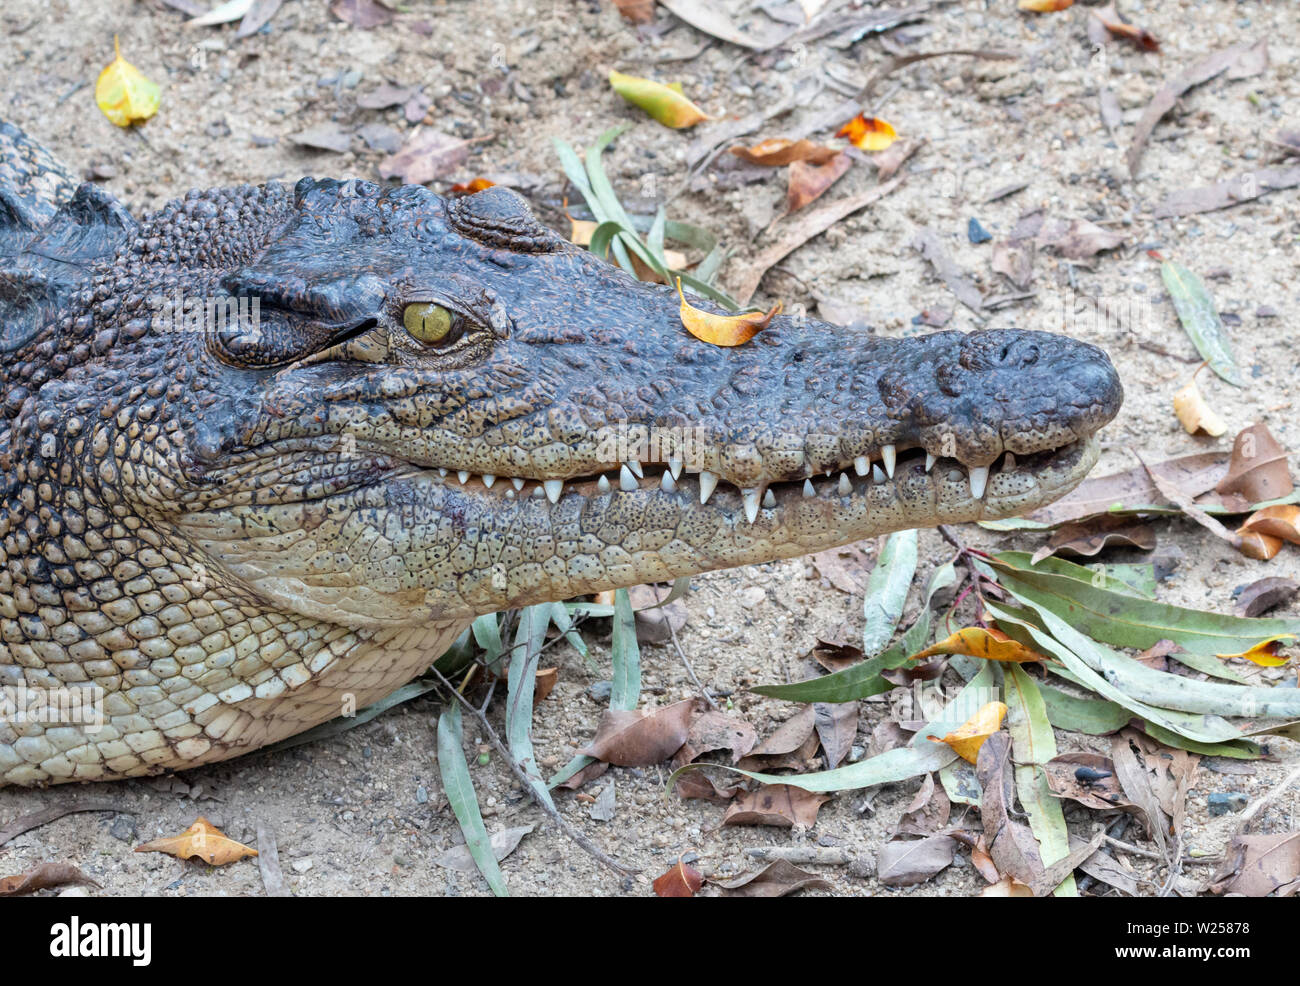 Saltwater Crocodile June 7th, 2019 Port Douglas, Australia - Stock Image